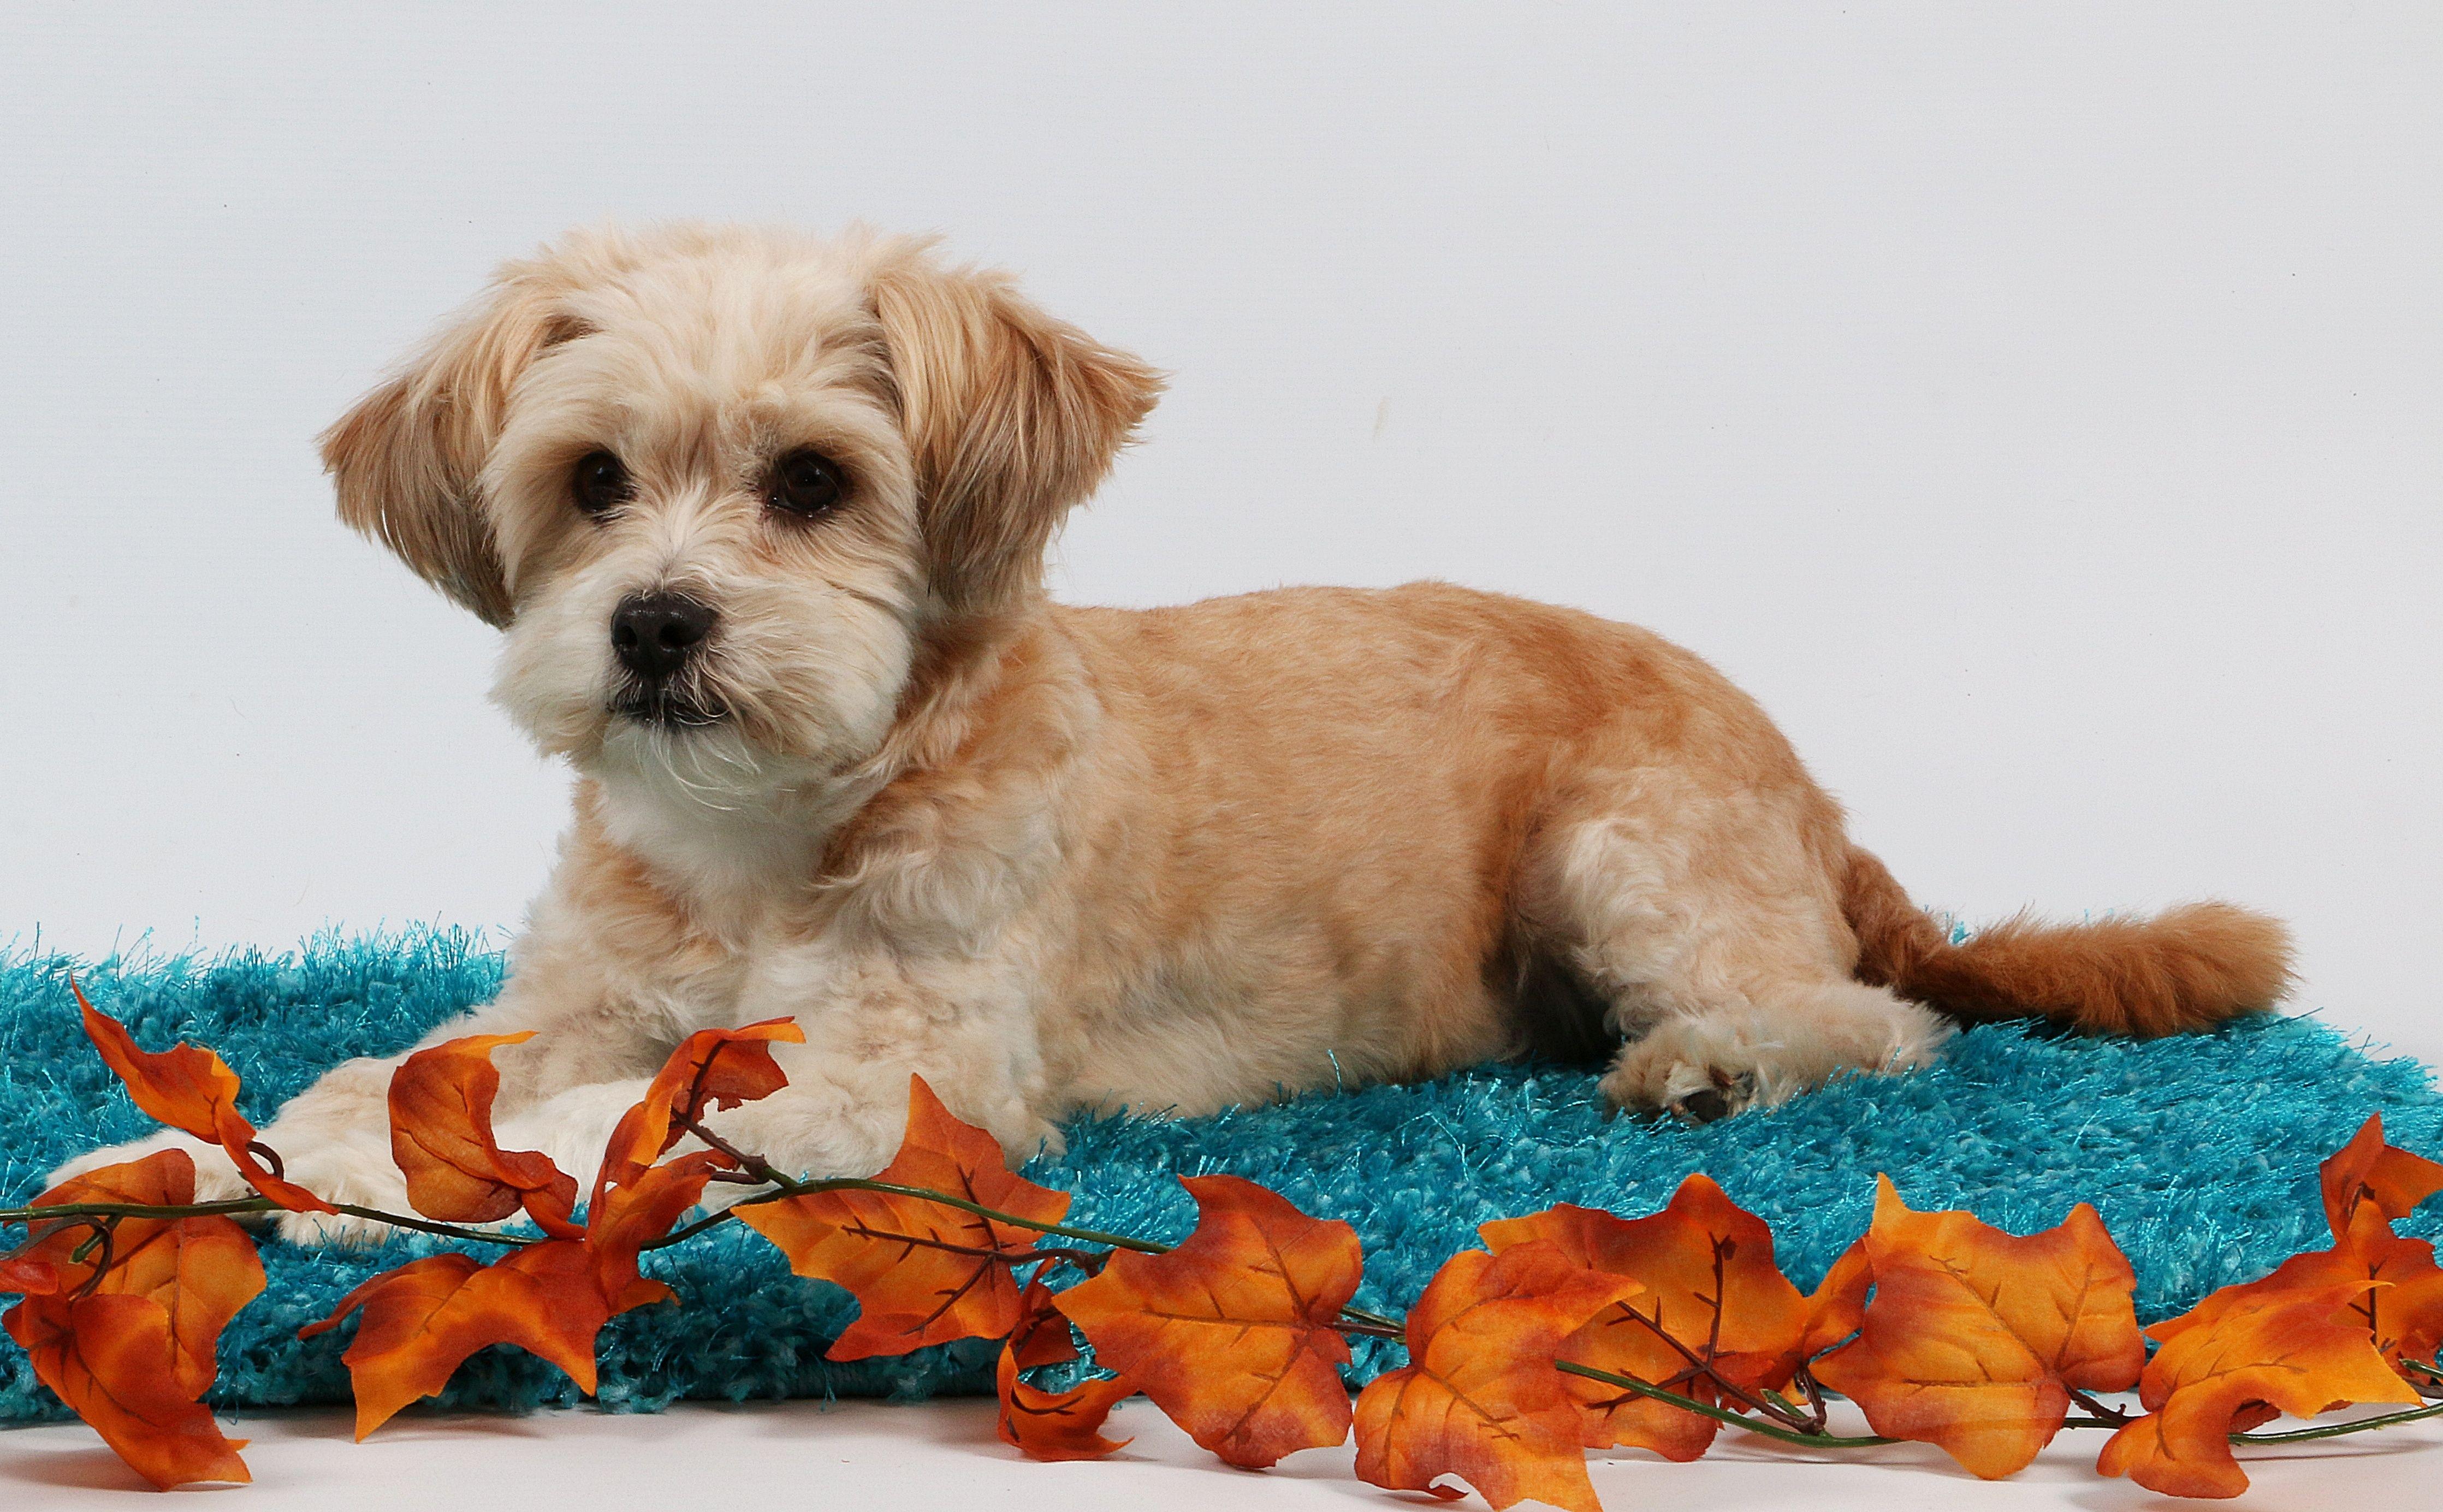 Shih Poo Your Guide To The Shih Tzu Poodle Mix Shih Tzu Poodle